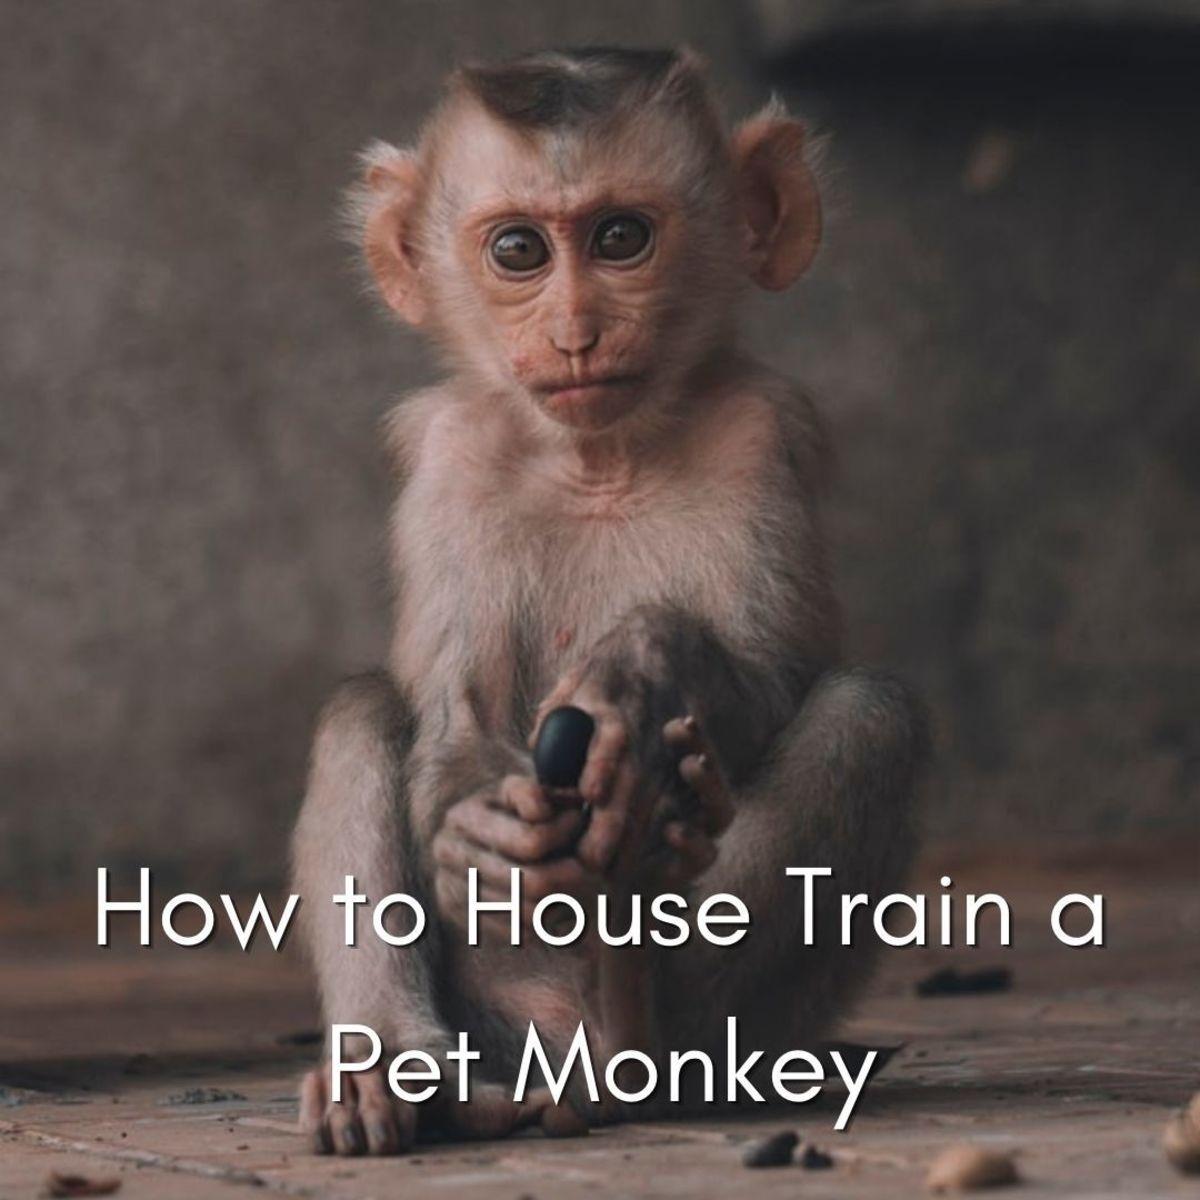 How to House Train a Pet Monkey